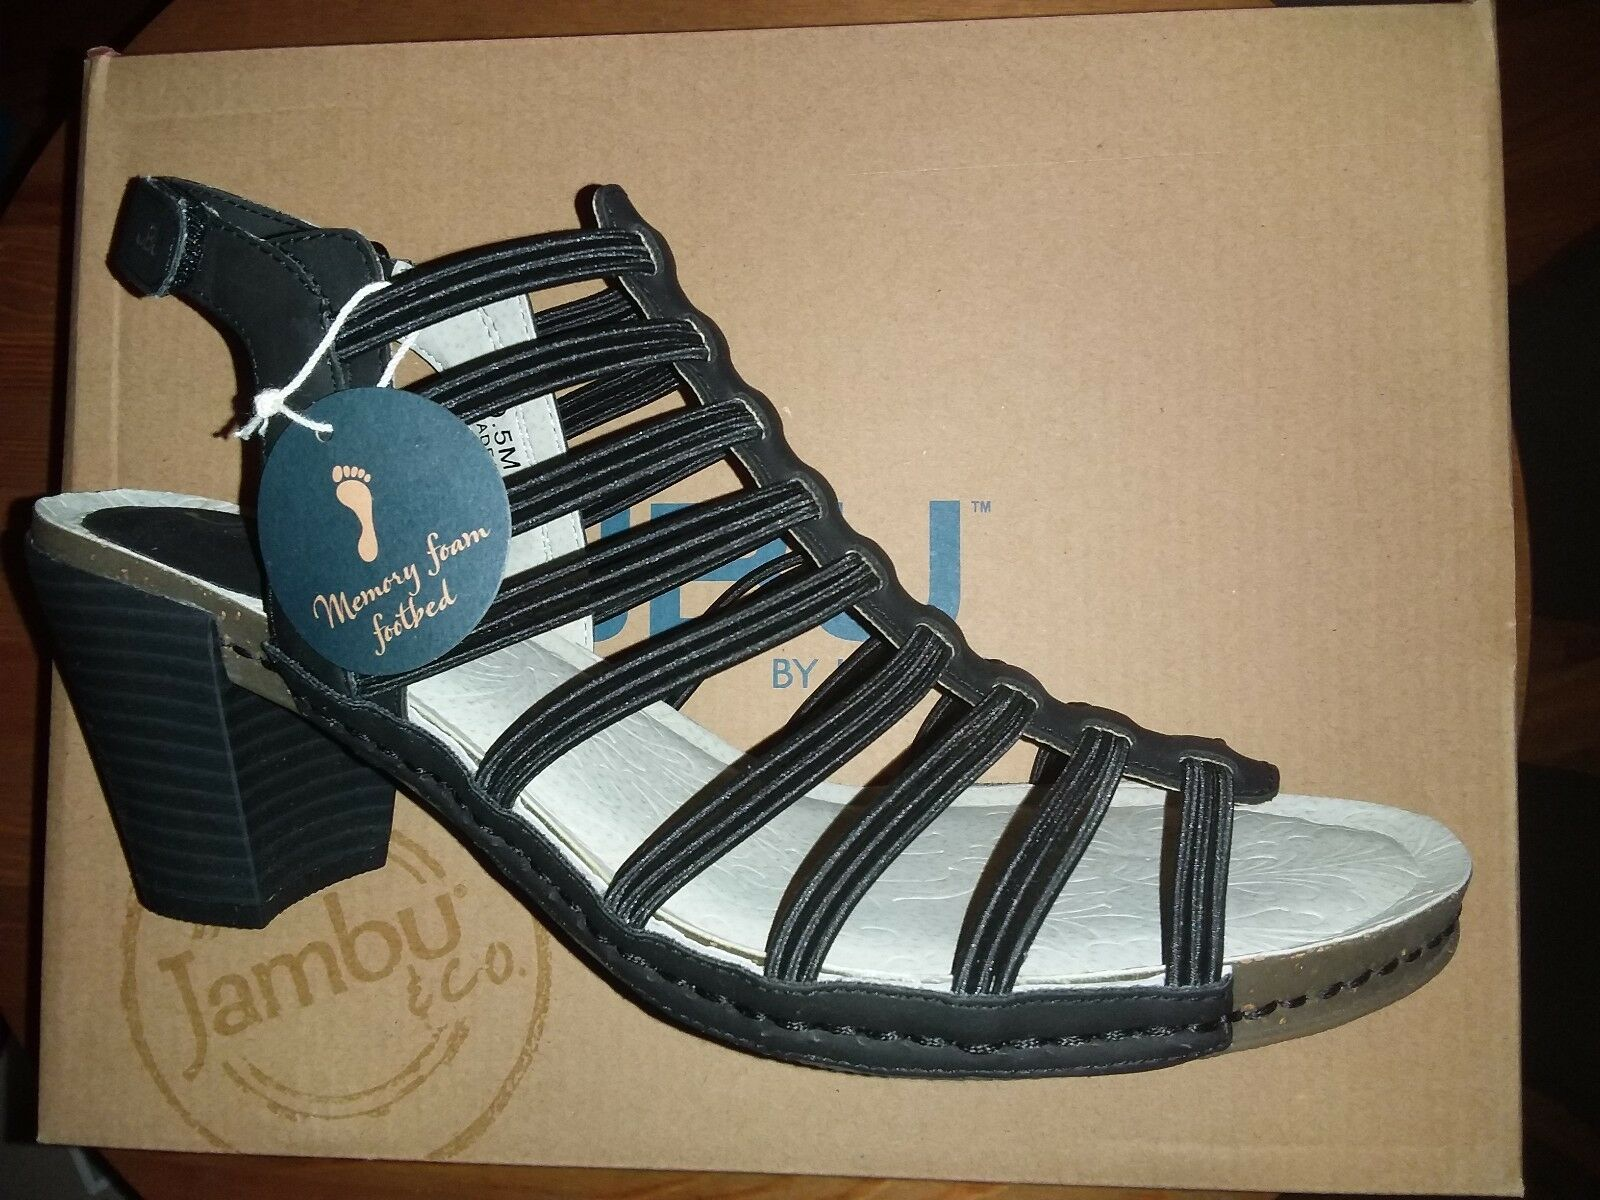 NEW JBU  Jambu black Women's Luna Heeled Sandals shoes VEGAN LEATHER SIZE 9.5 M